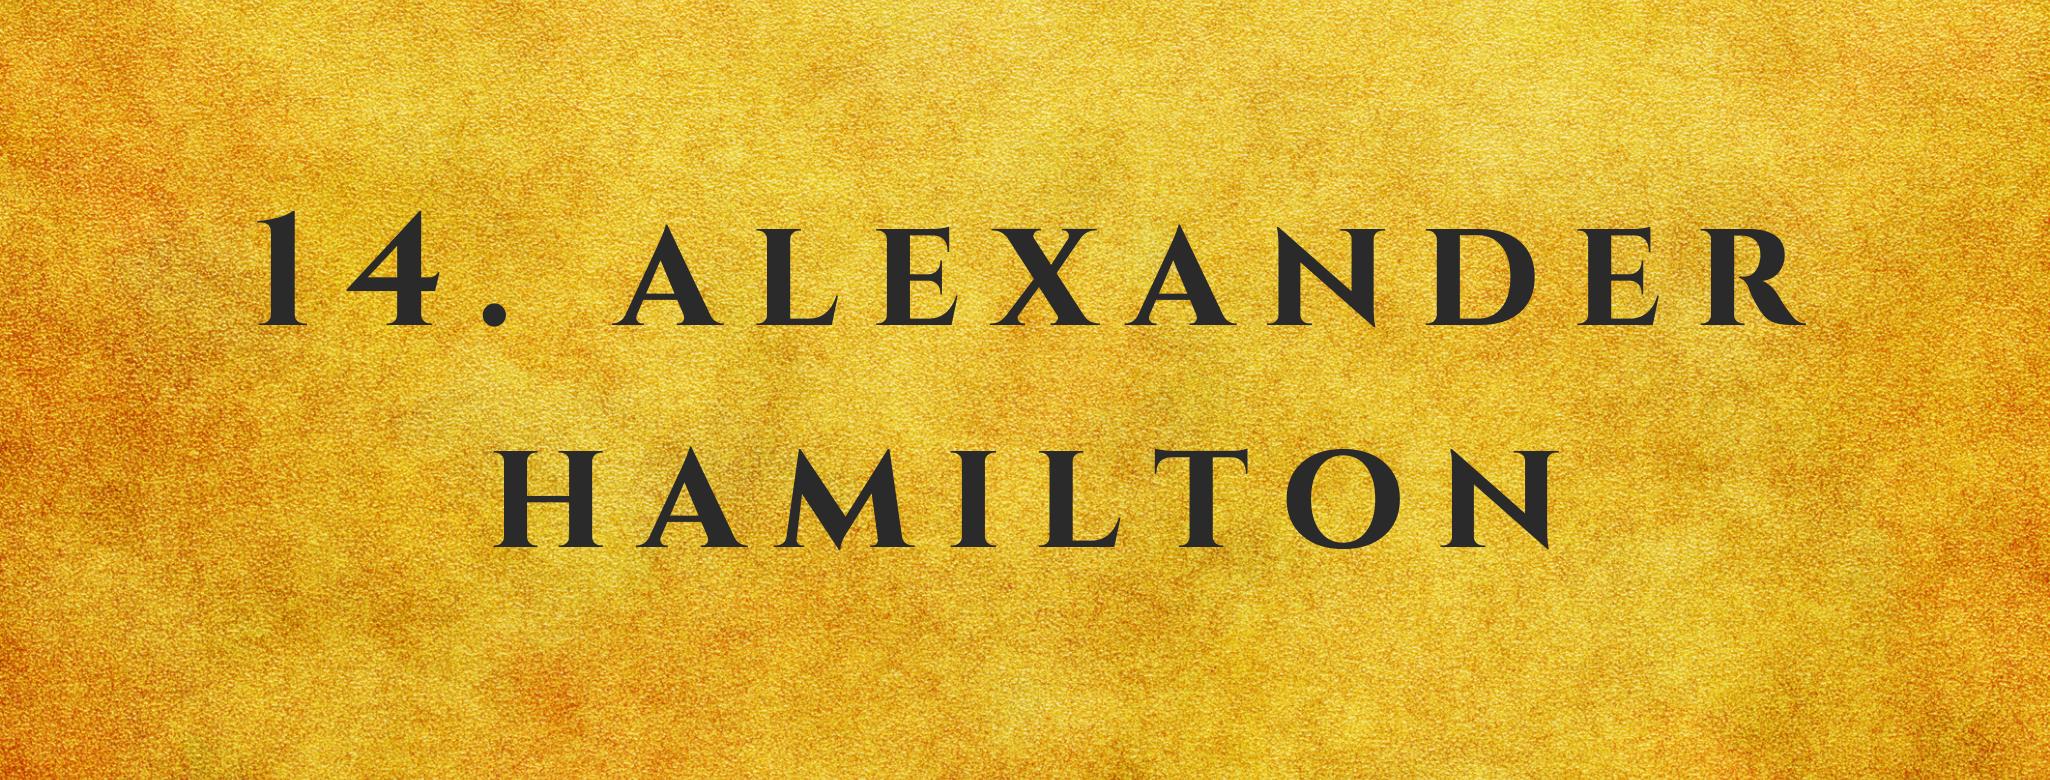 #14 Alexander Hamilton